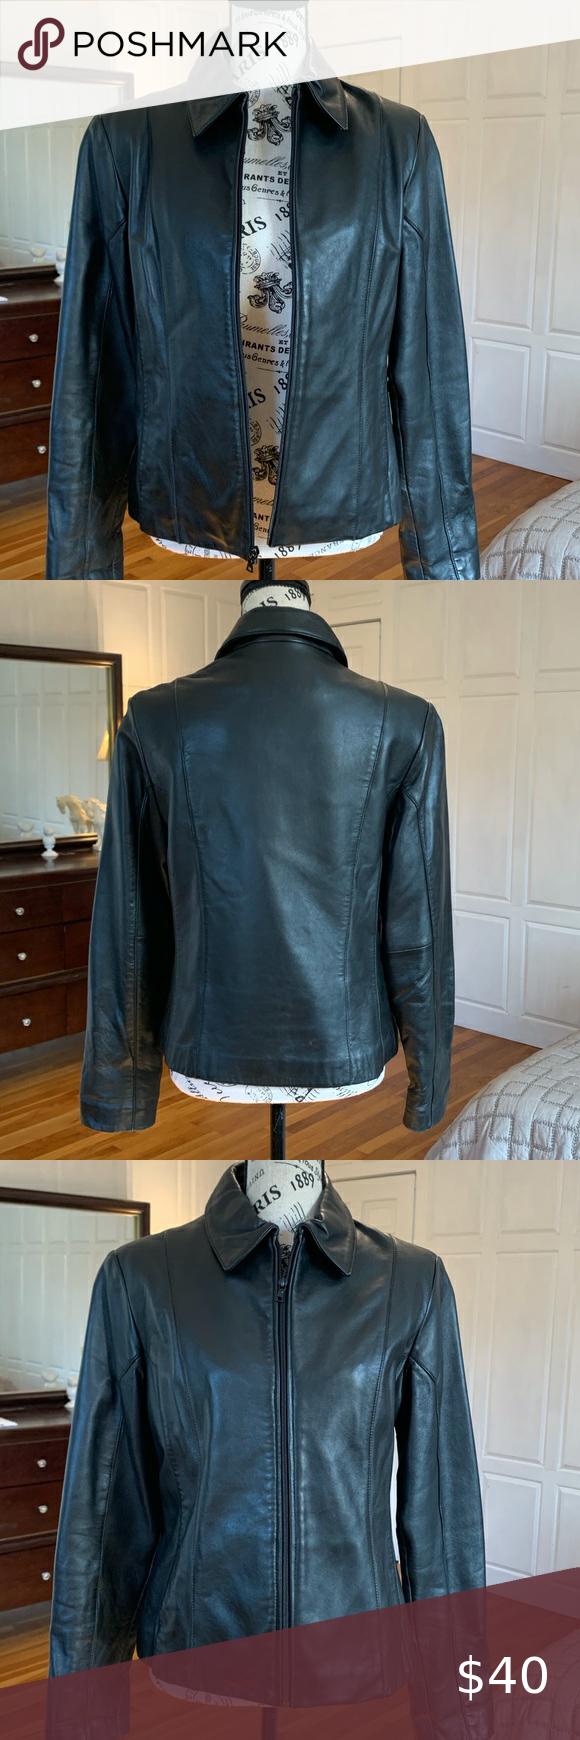 Jones New York Leather Jacket Black Leather Jacket Black Leather Jacket Jones New York [ 1740 x 580 Pixel ]